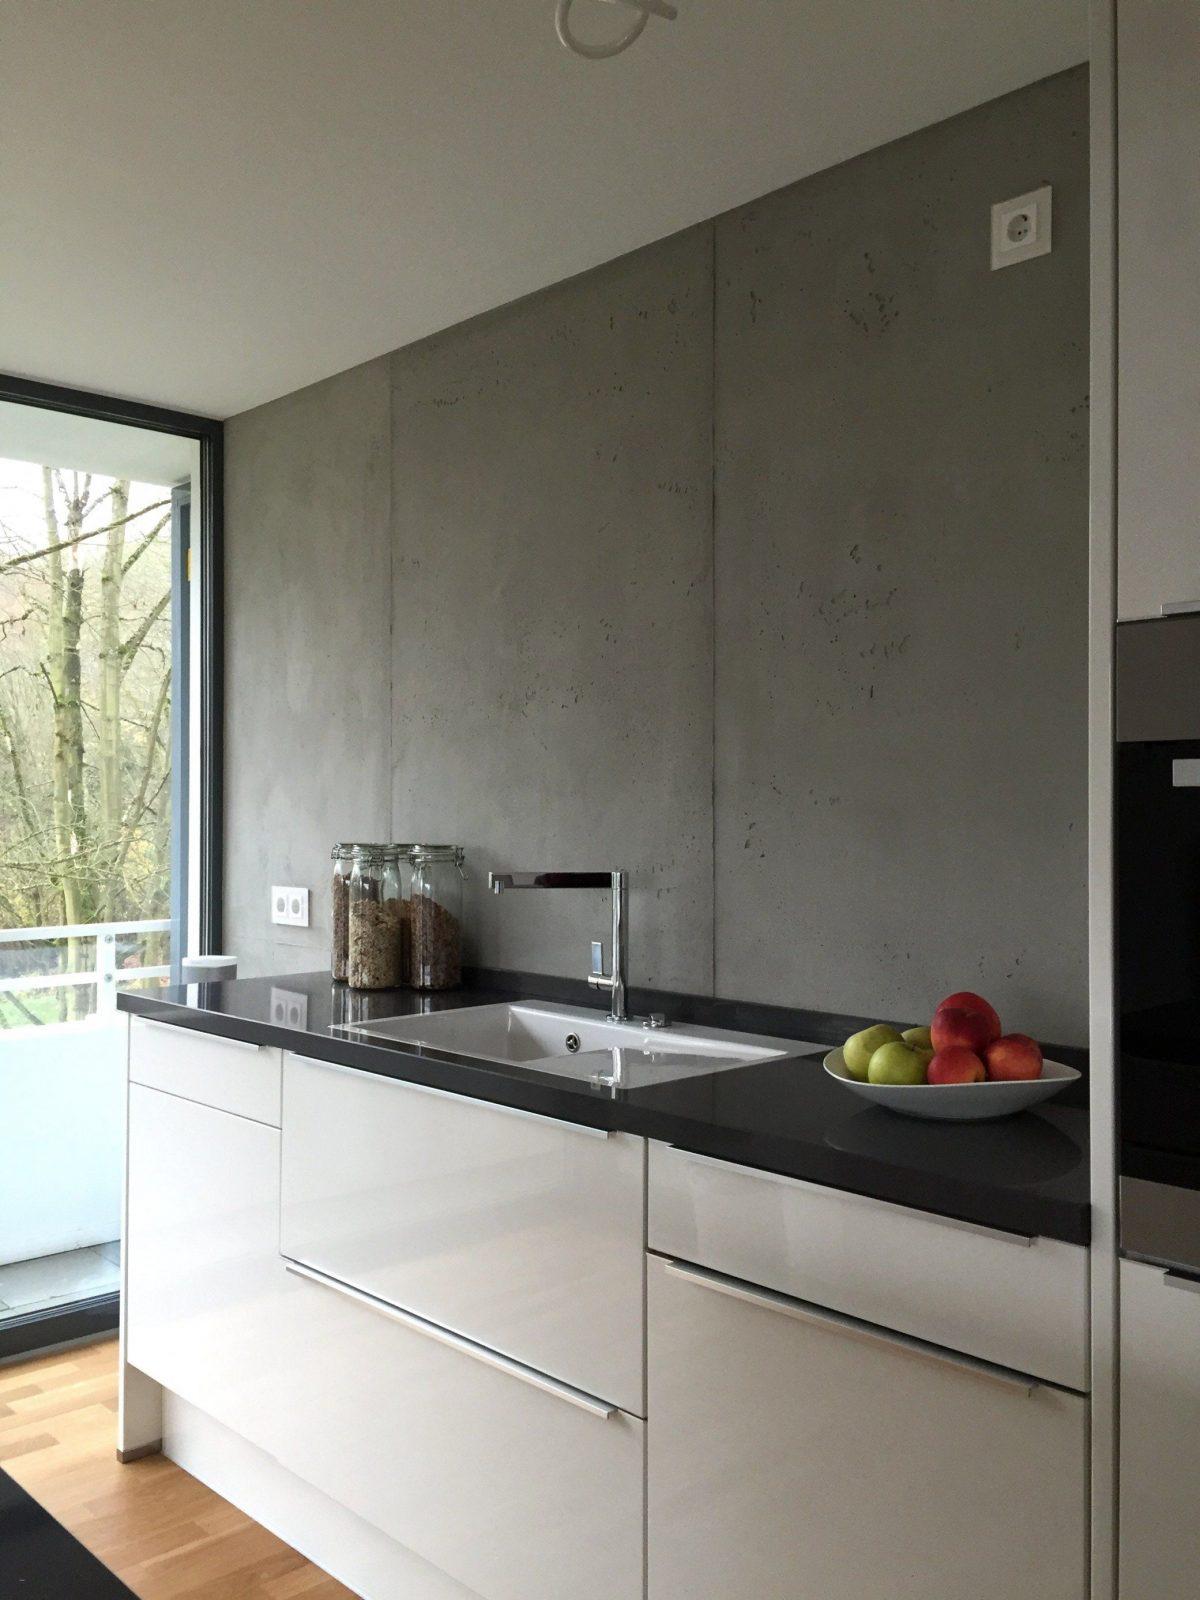 Farbe Abwaschbar Küche Wunderbar Abwaschbare Farbe Küche Ideas von Abwaschbare Farbe Für Küche